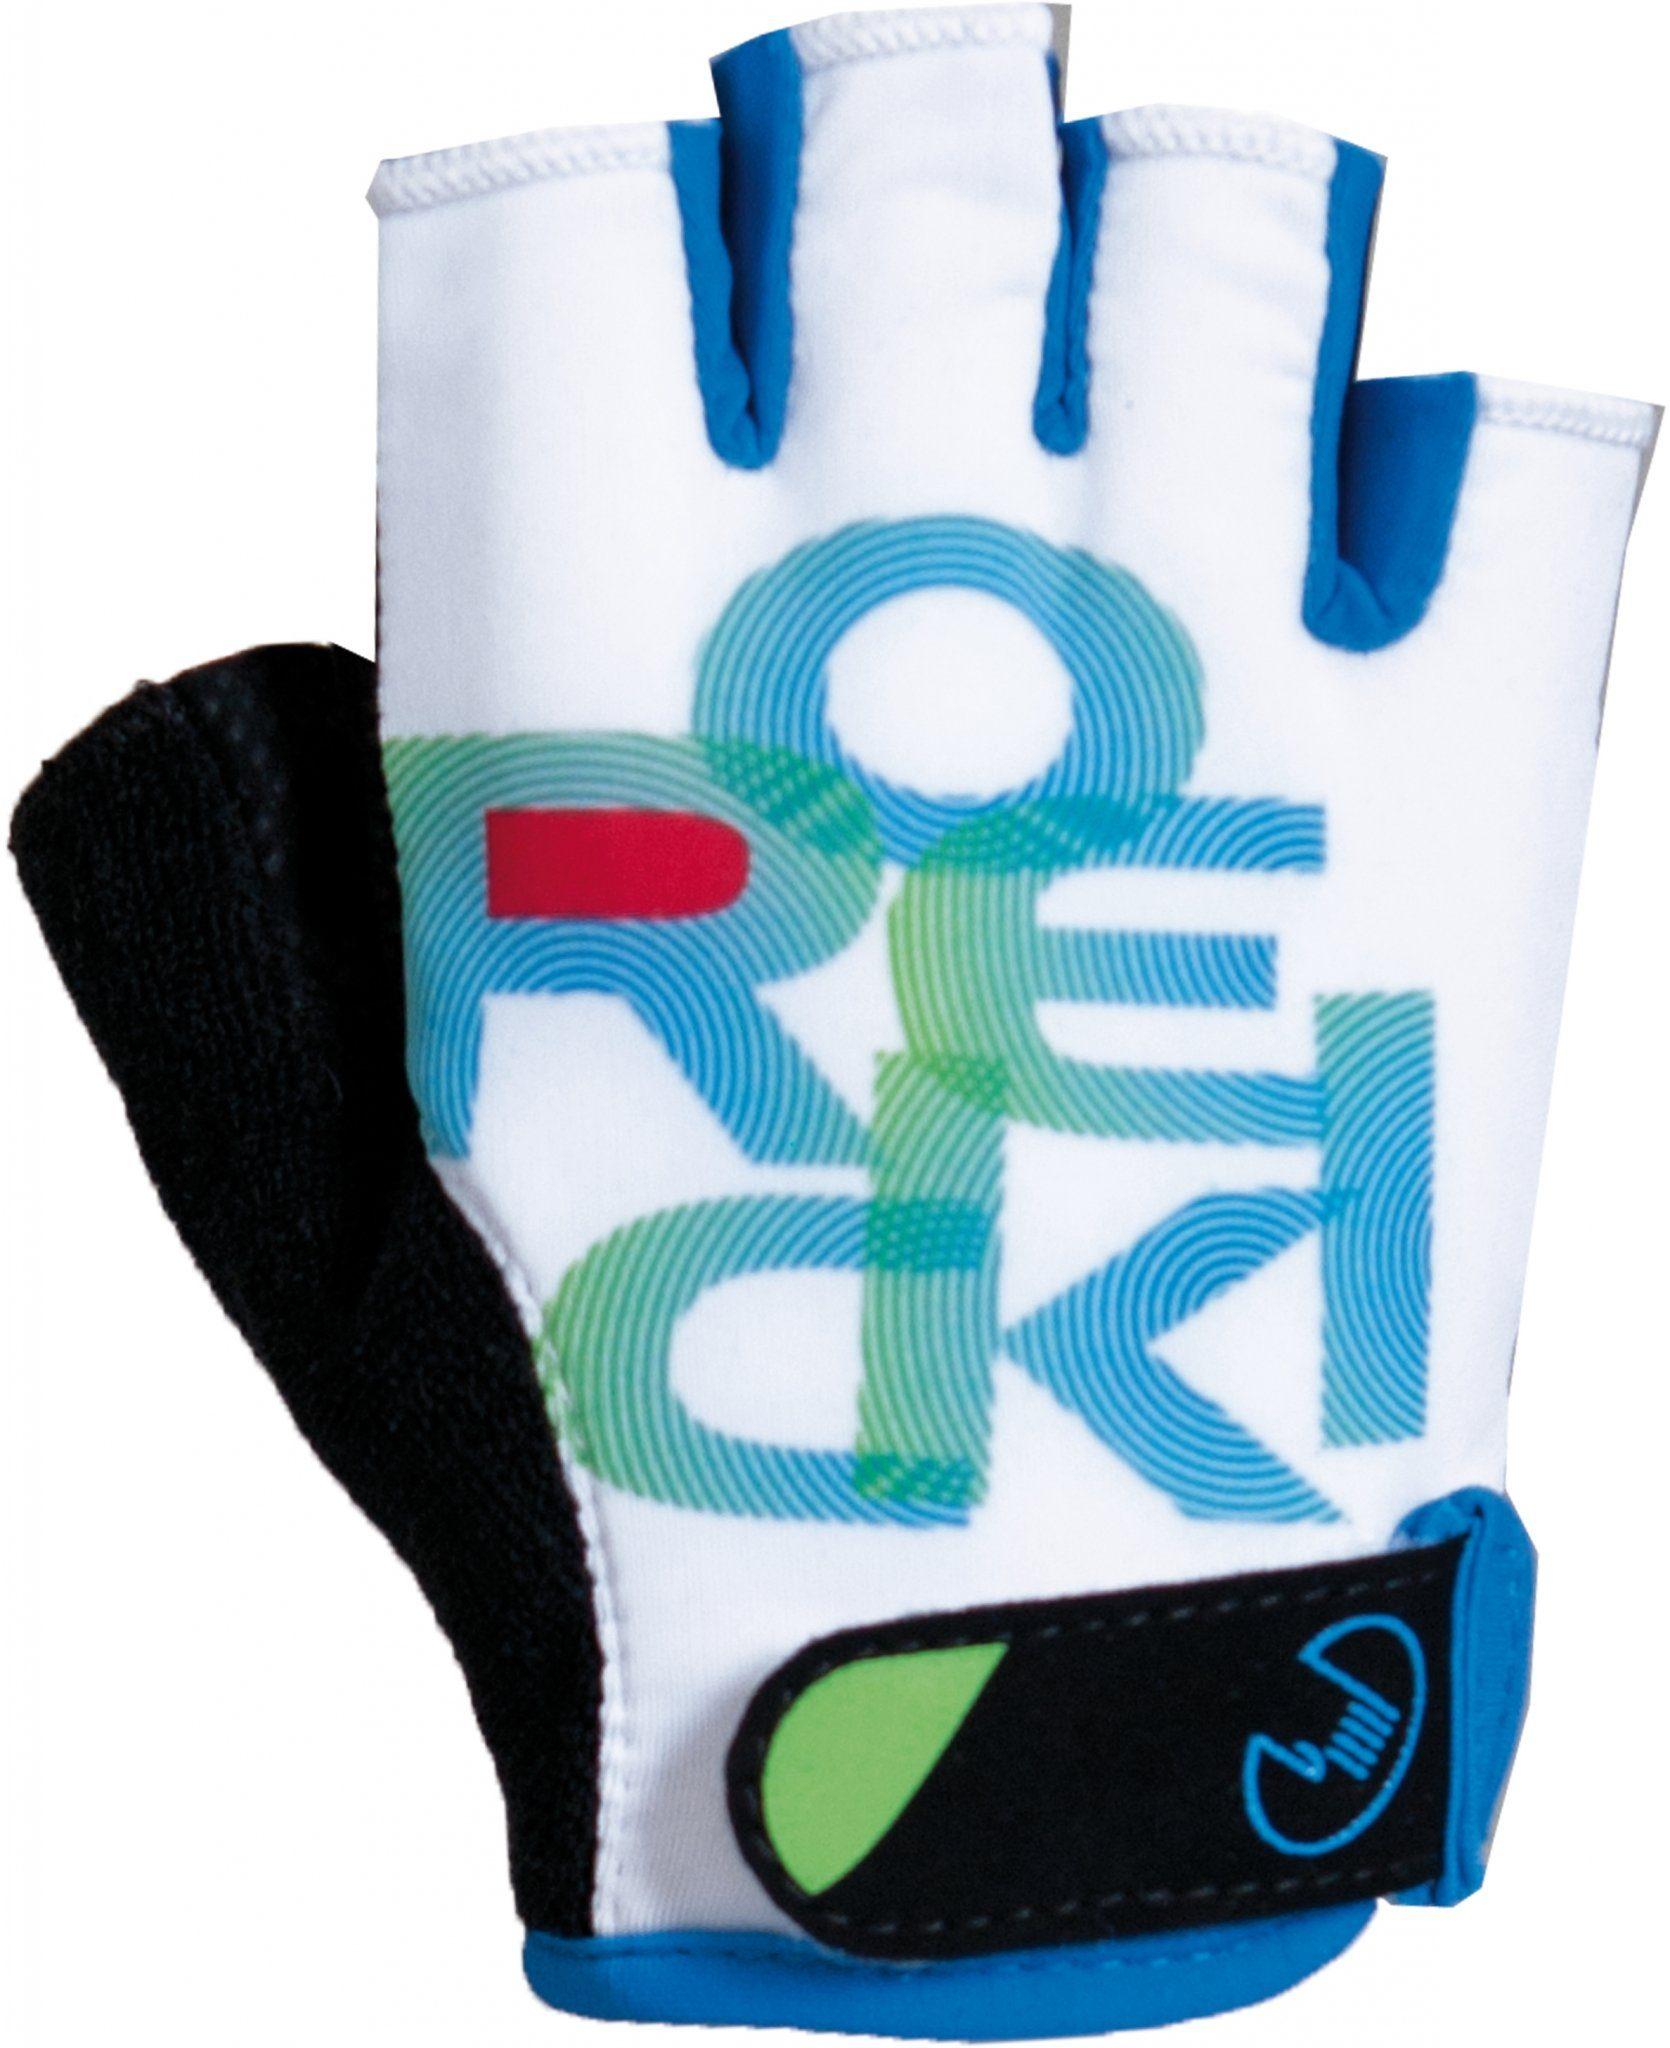 Roeckl Fahrrad Handschuhe »Zuri Handschuhe Juniors«